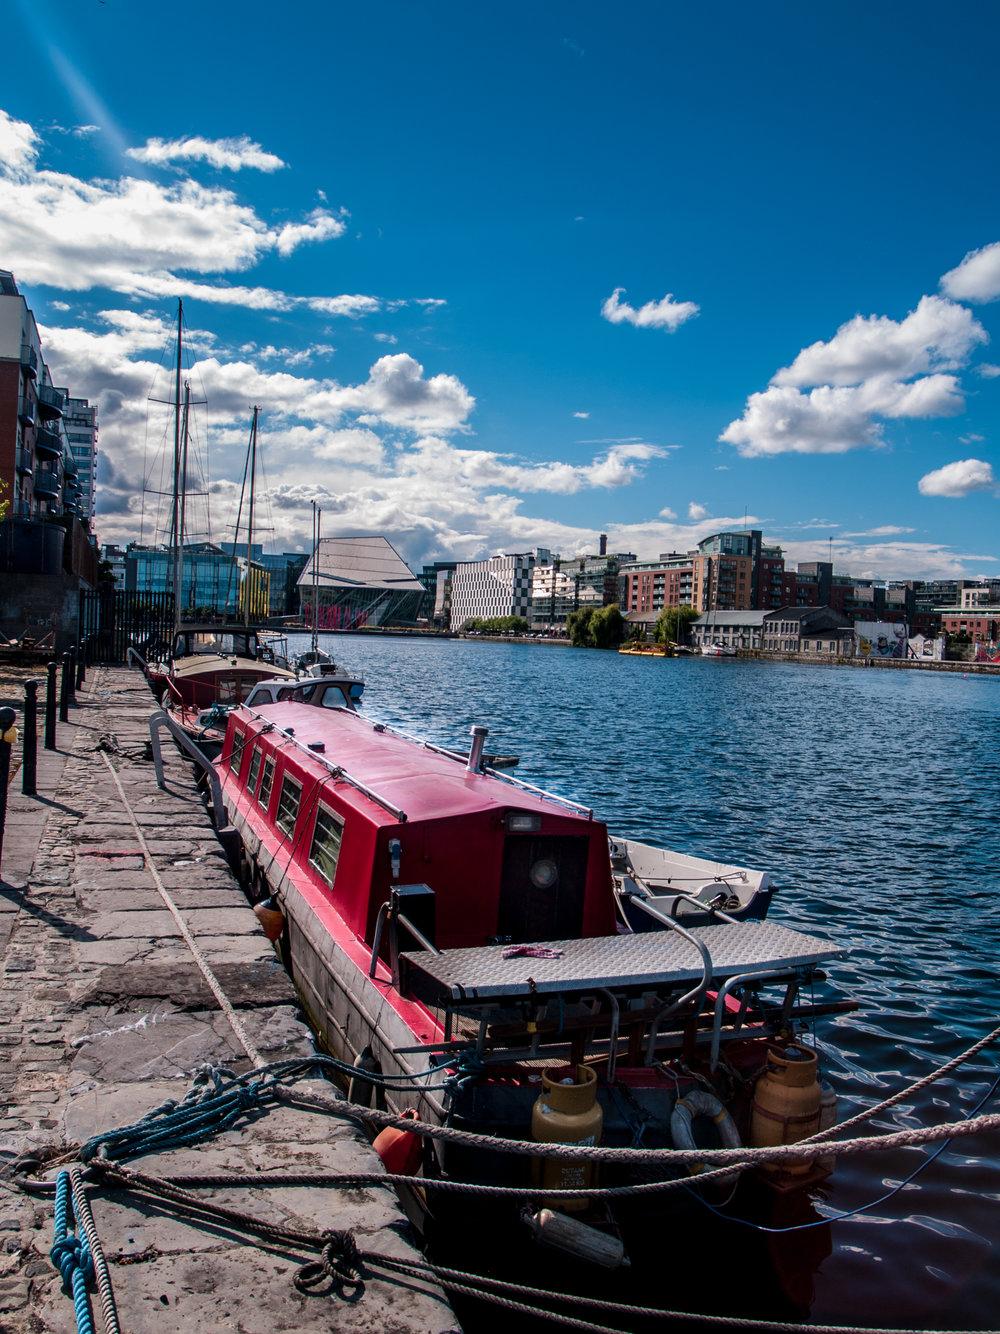 Dublin. Dublin city. street photography. ireland. travel. travel photography. photowalk. walking. people. street. art. on the street. river boat. liffey.jpg